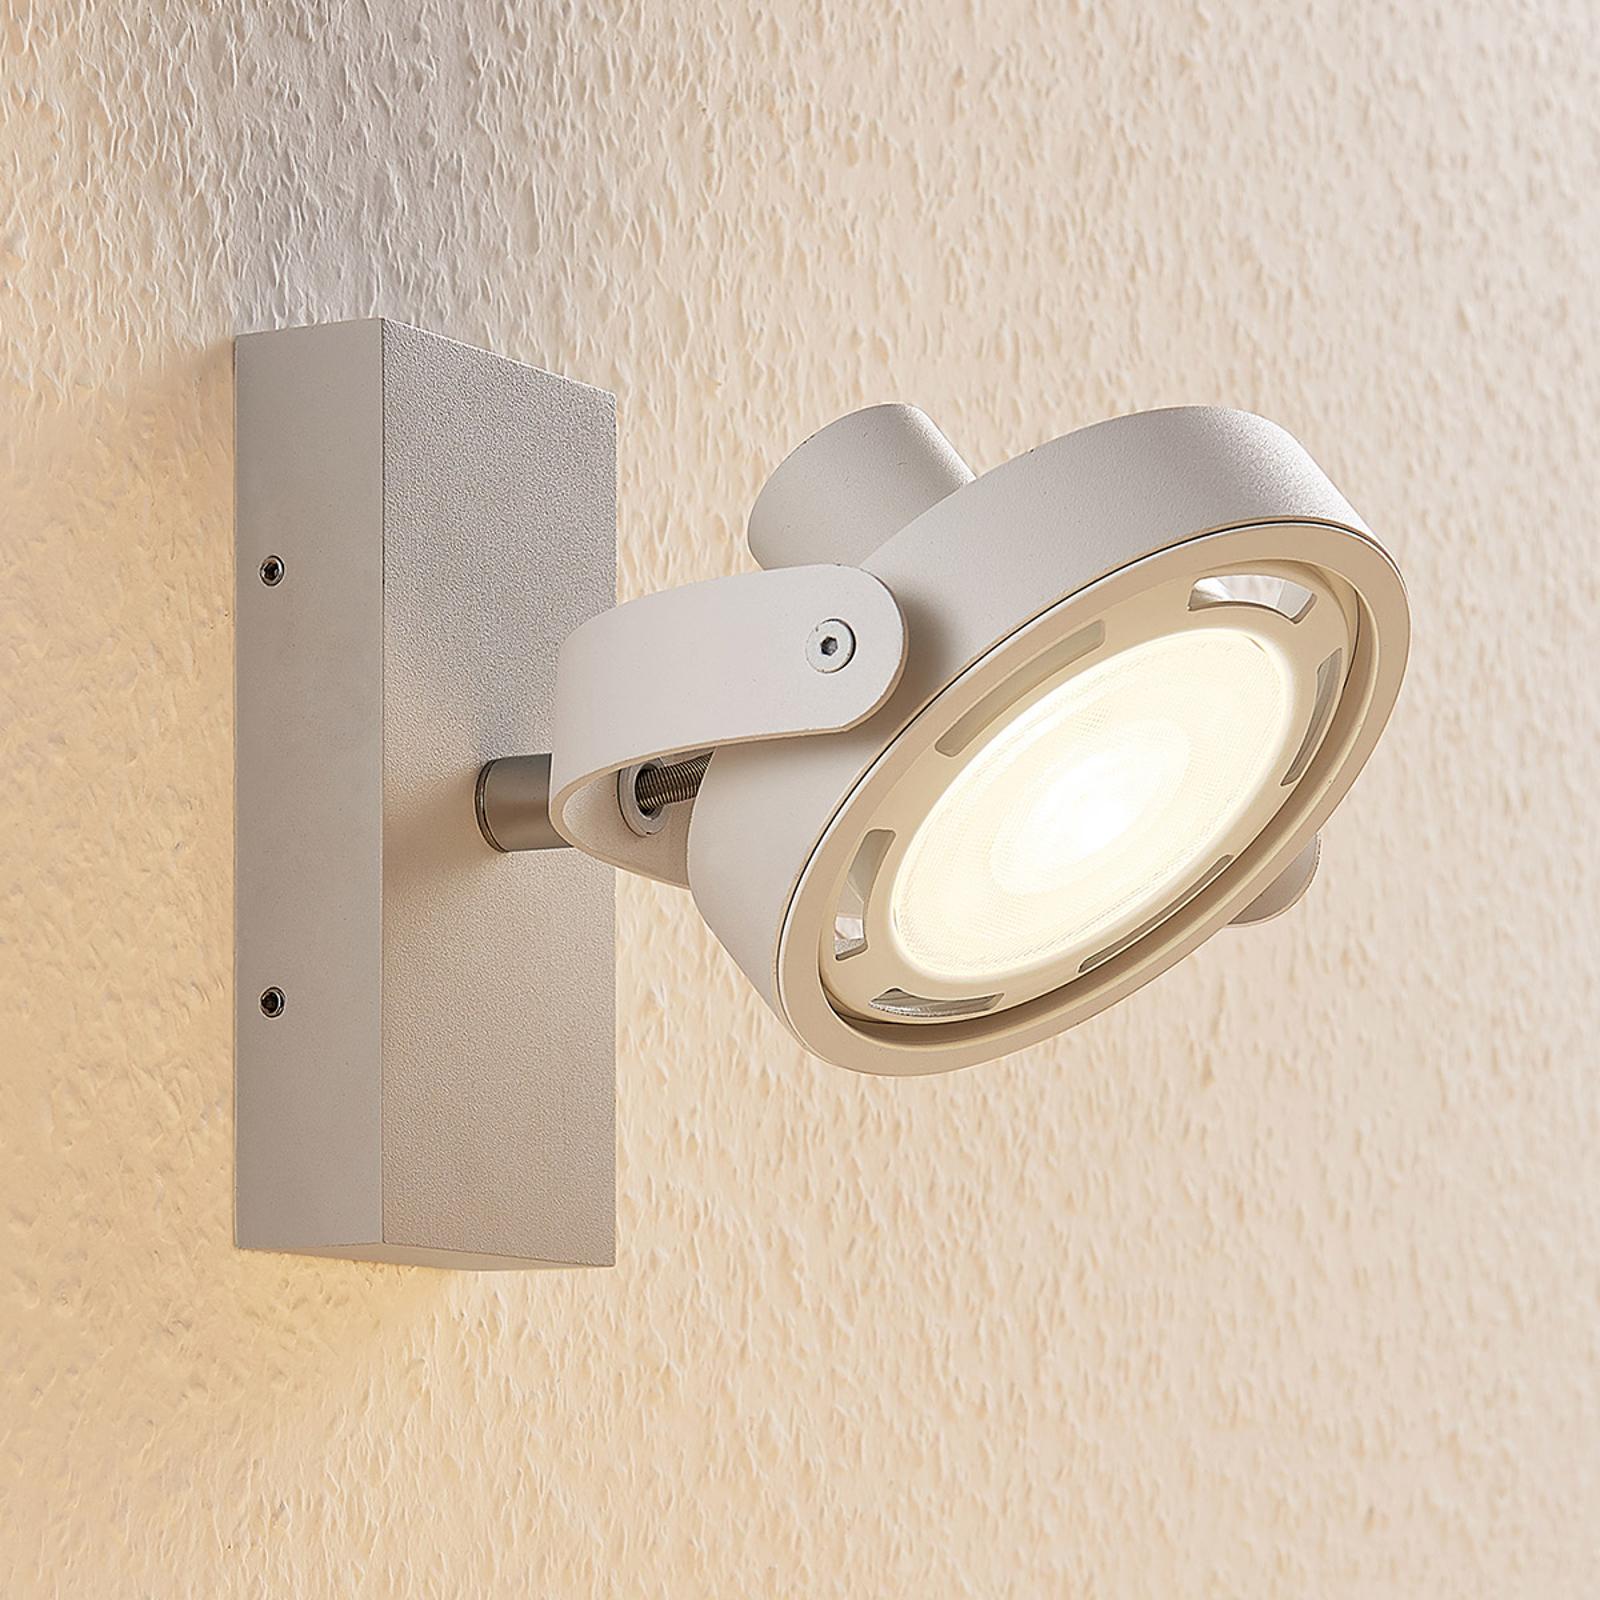 LED-Strahler Munin, dimmbar, weiß, 1-flammig